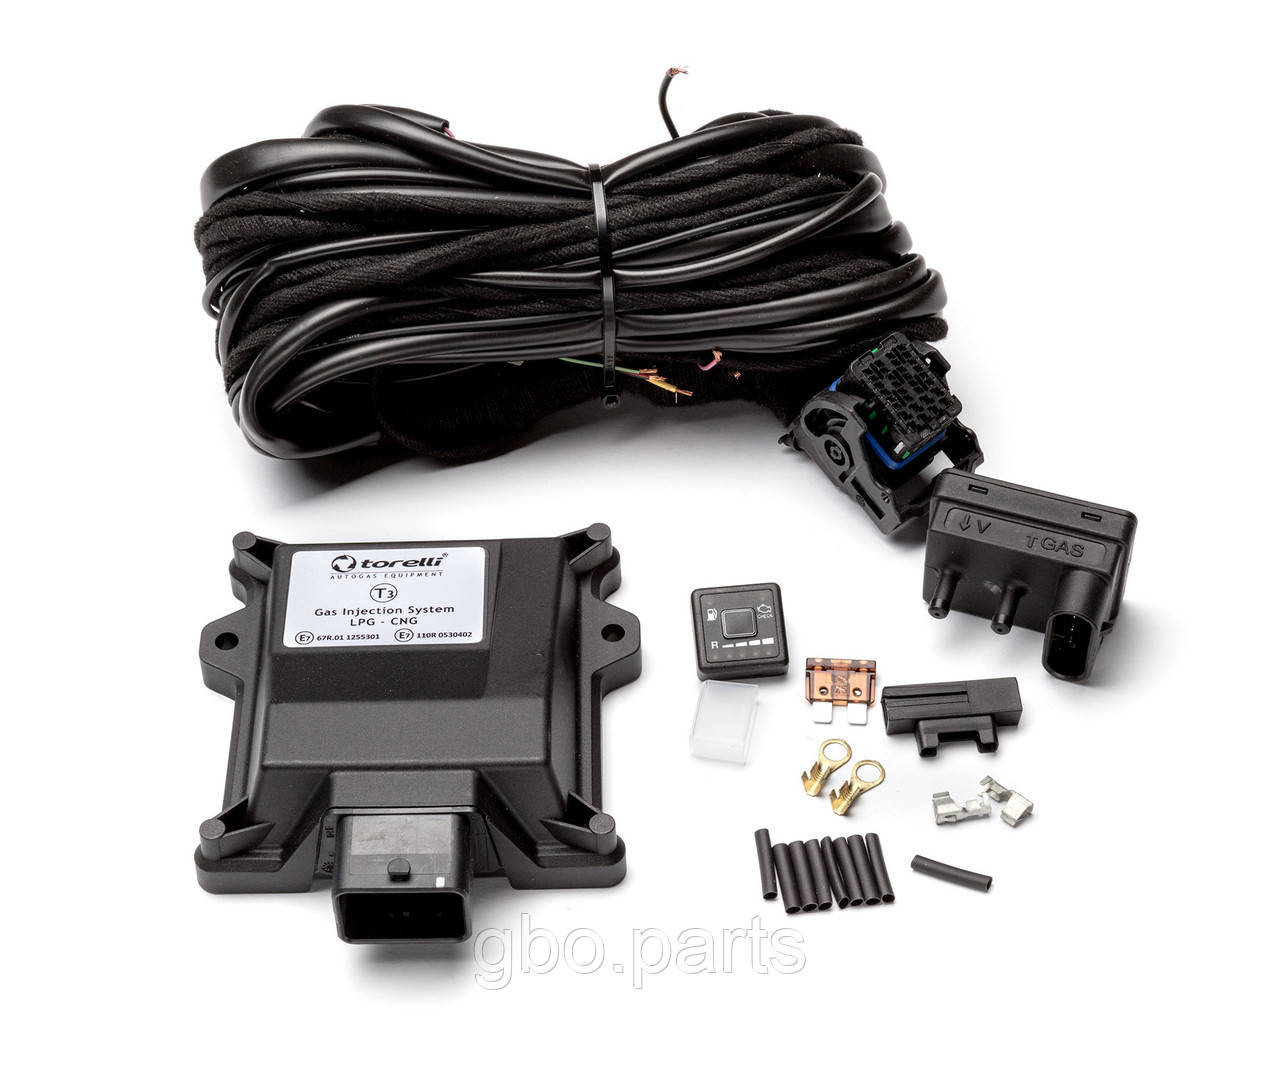 Електроніка Torelli T3 Pro (Autronic) на 4 циліндра з проводкою